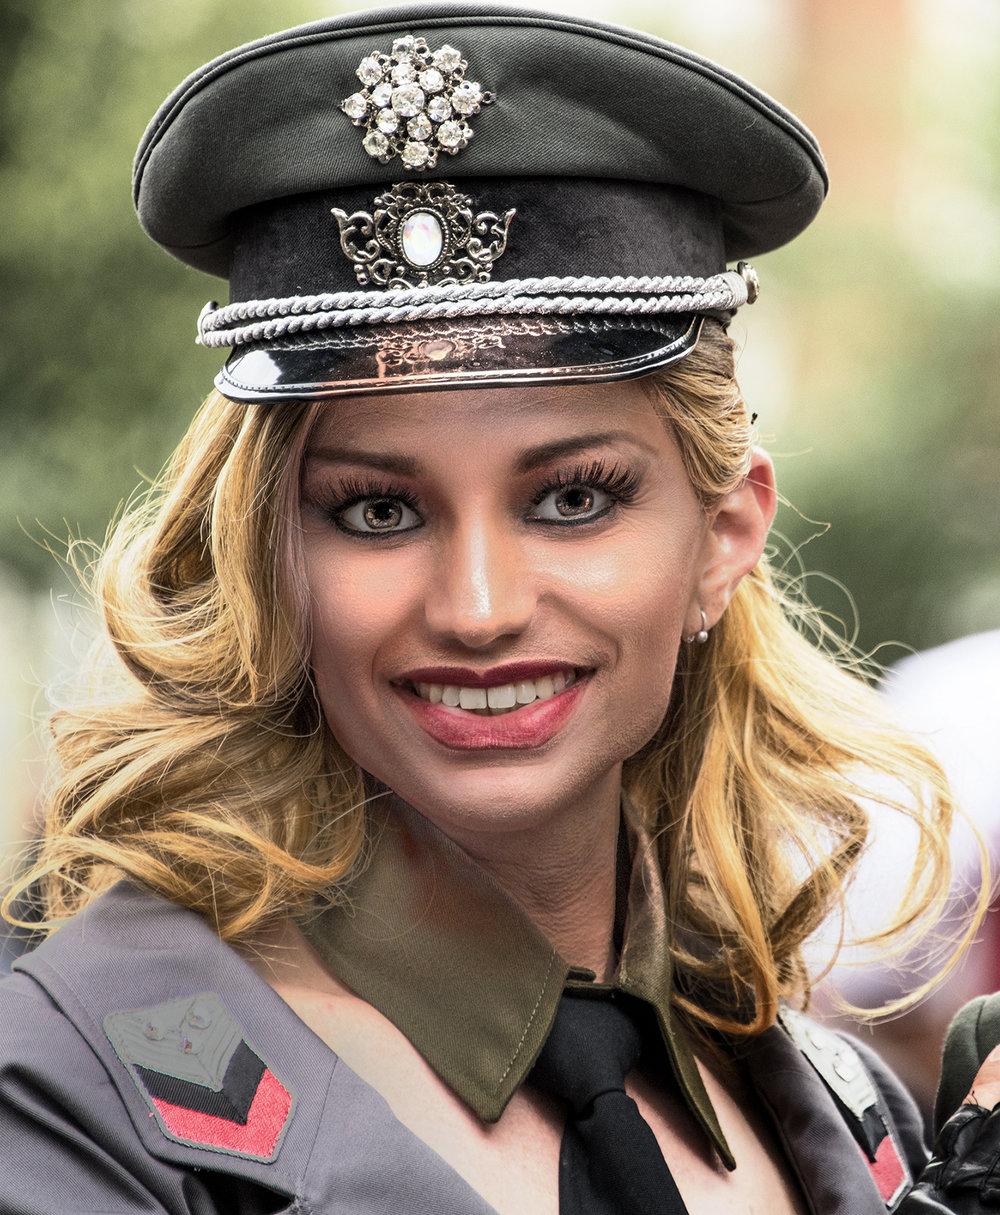 43_MICHAEL_WINTERS_VIENNA_PARADE_PARTICIPANT_LGBT_MARCHER_1.JPG